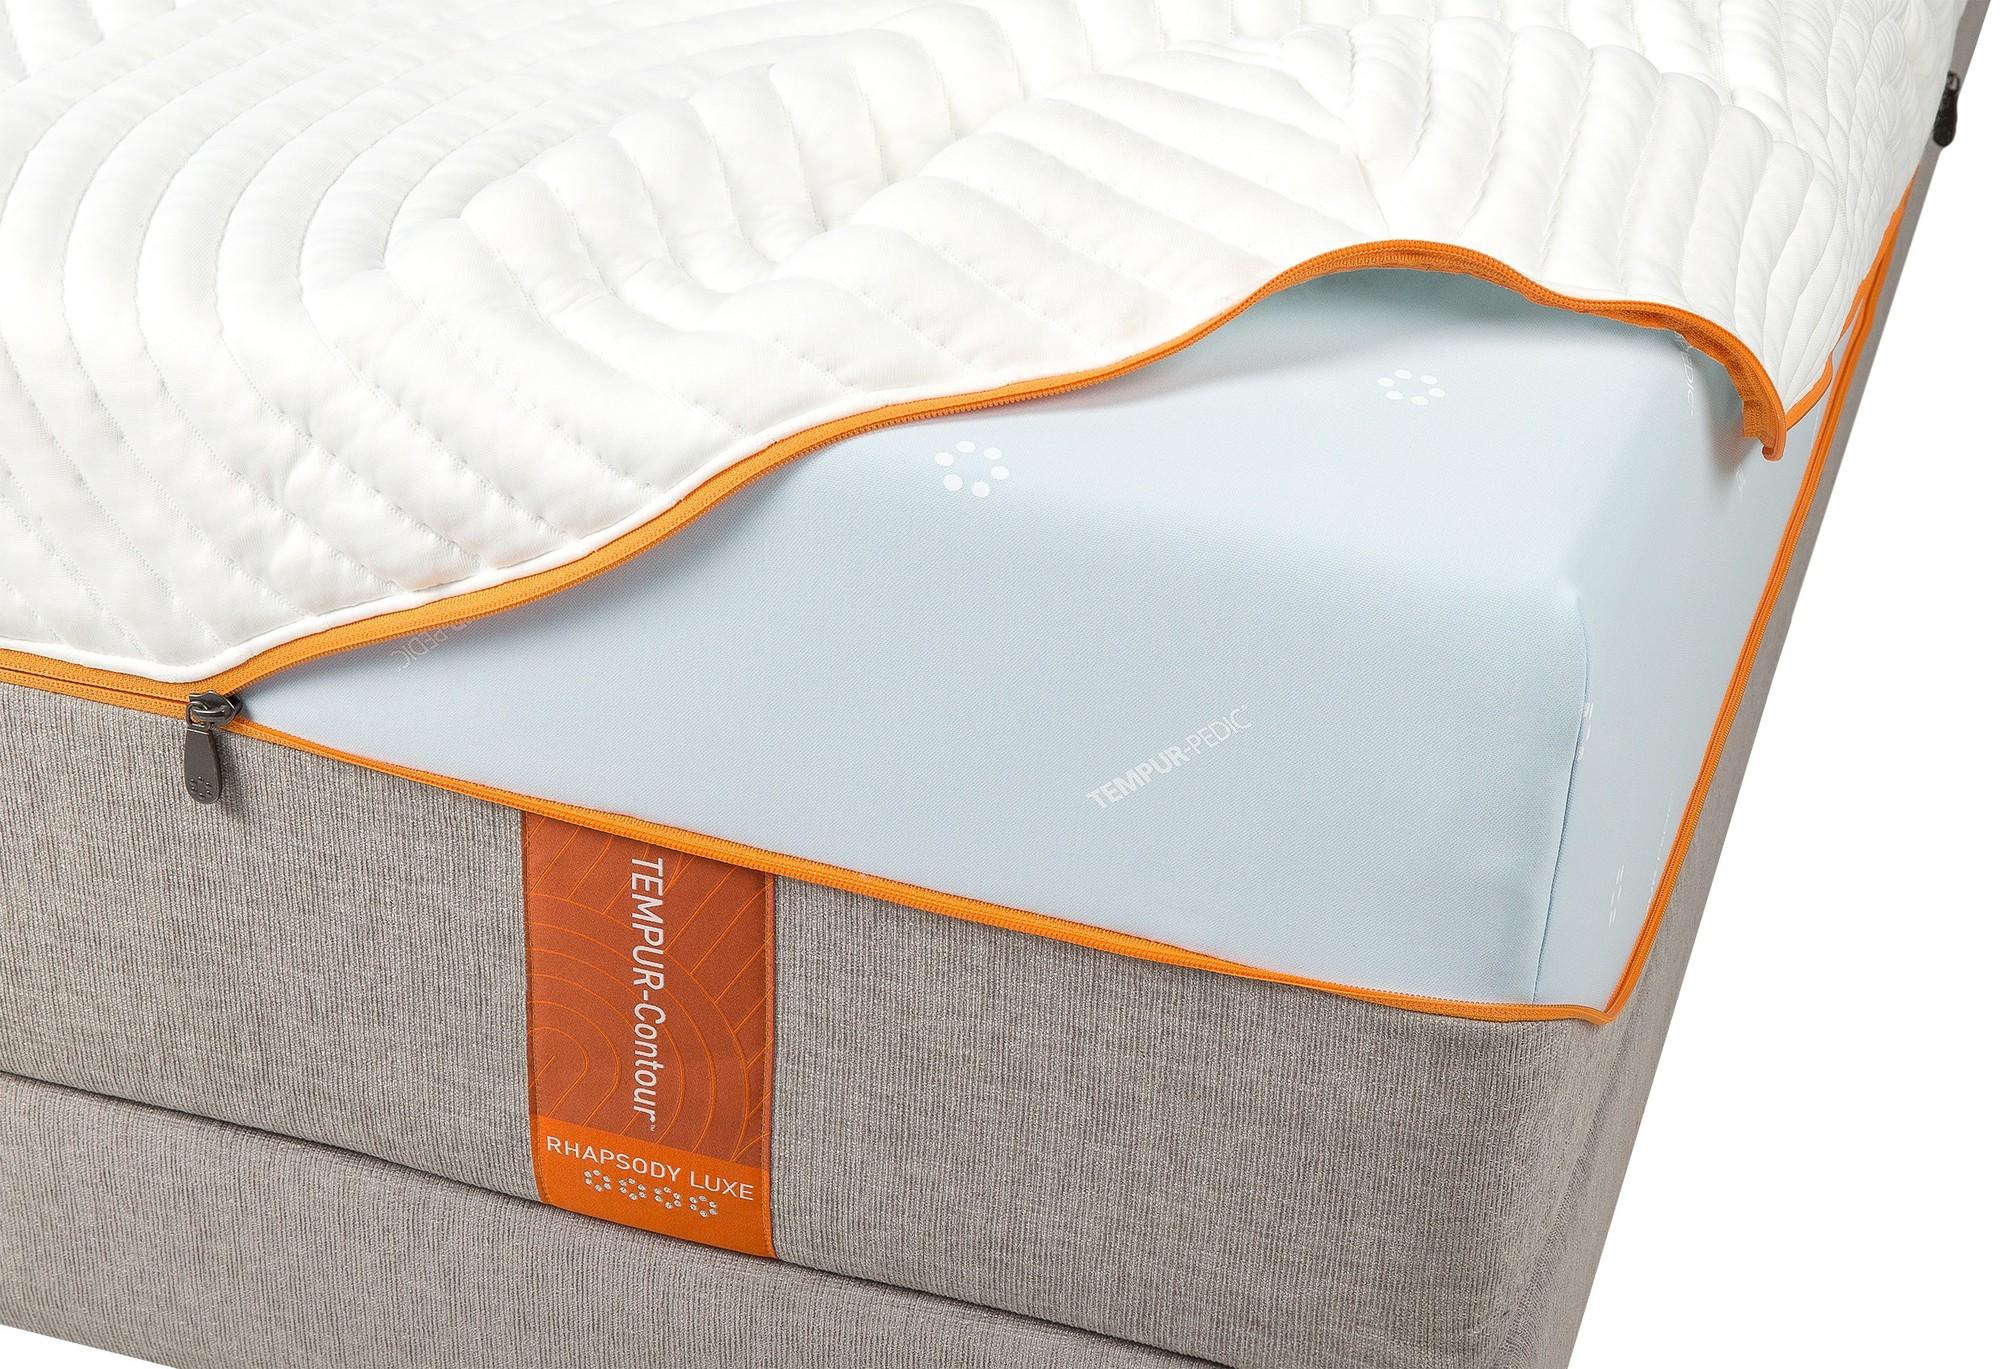 A Tempur Contour Elite mattress cover